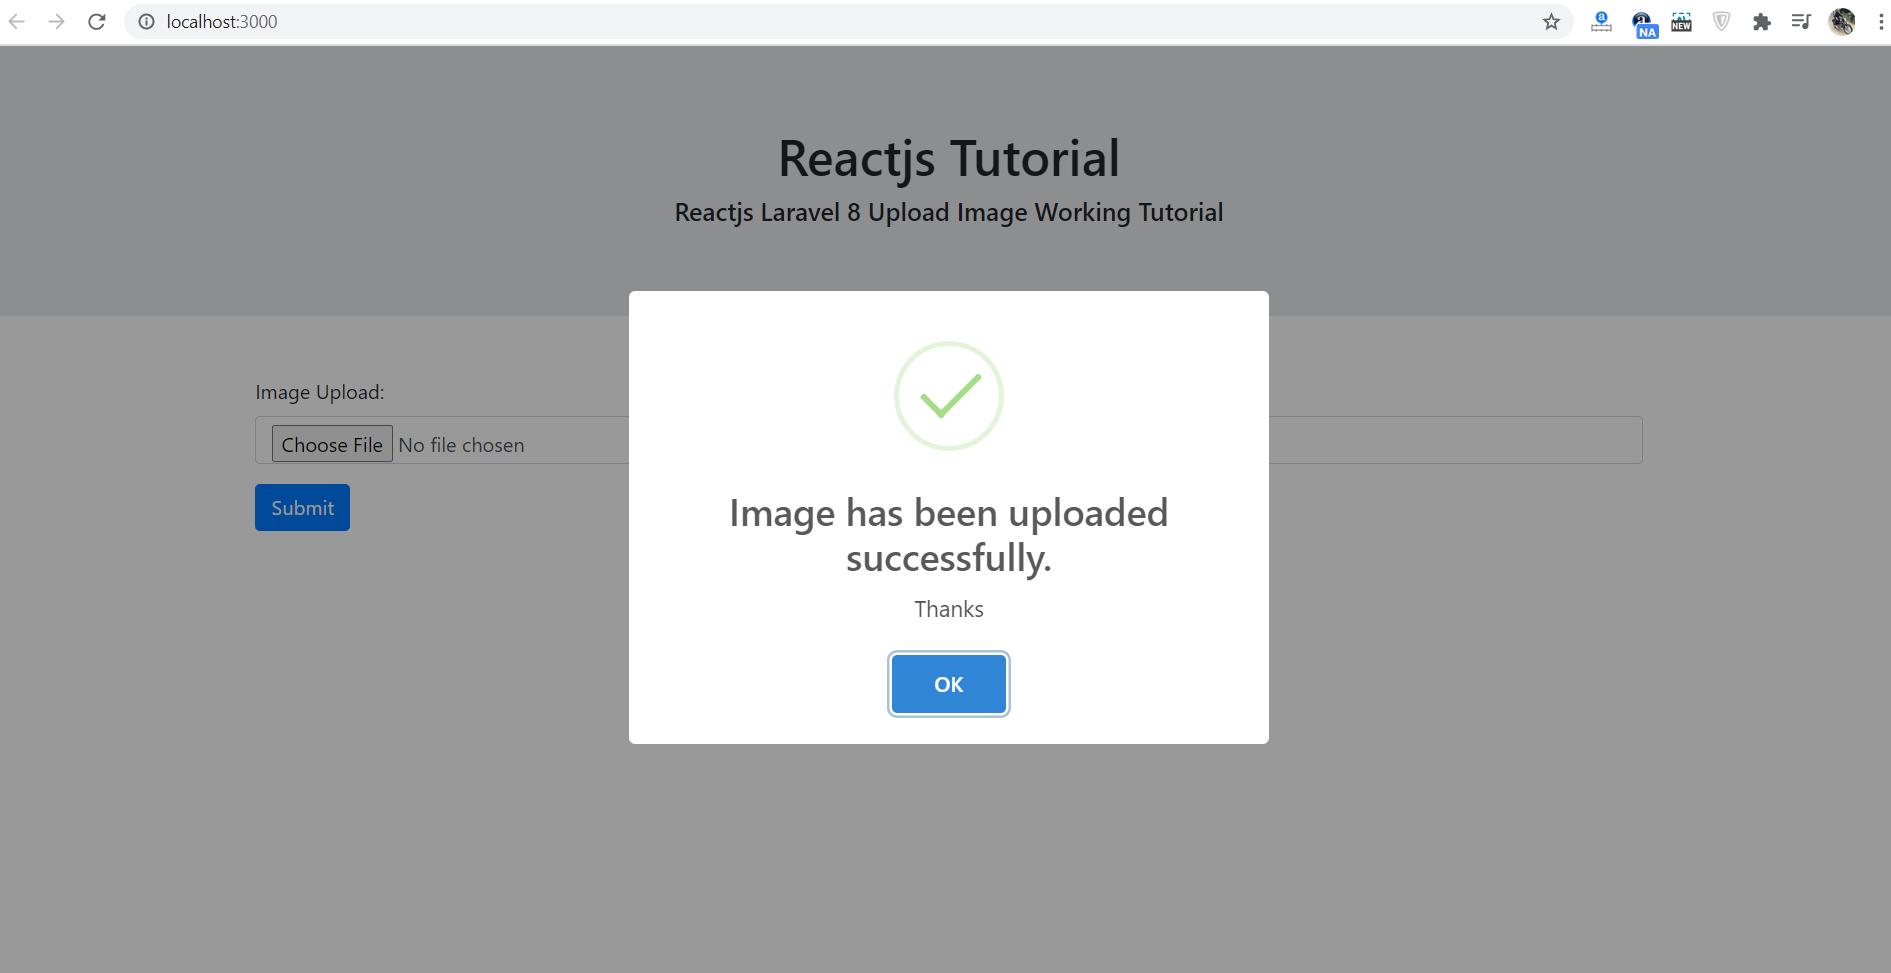 Reactjs Laravel 8 Image Upload Working Tutorial